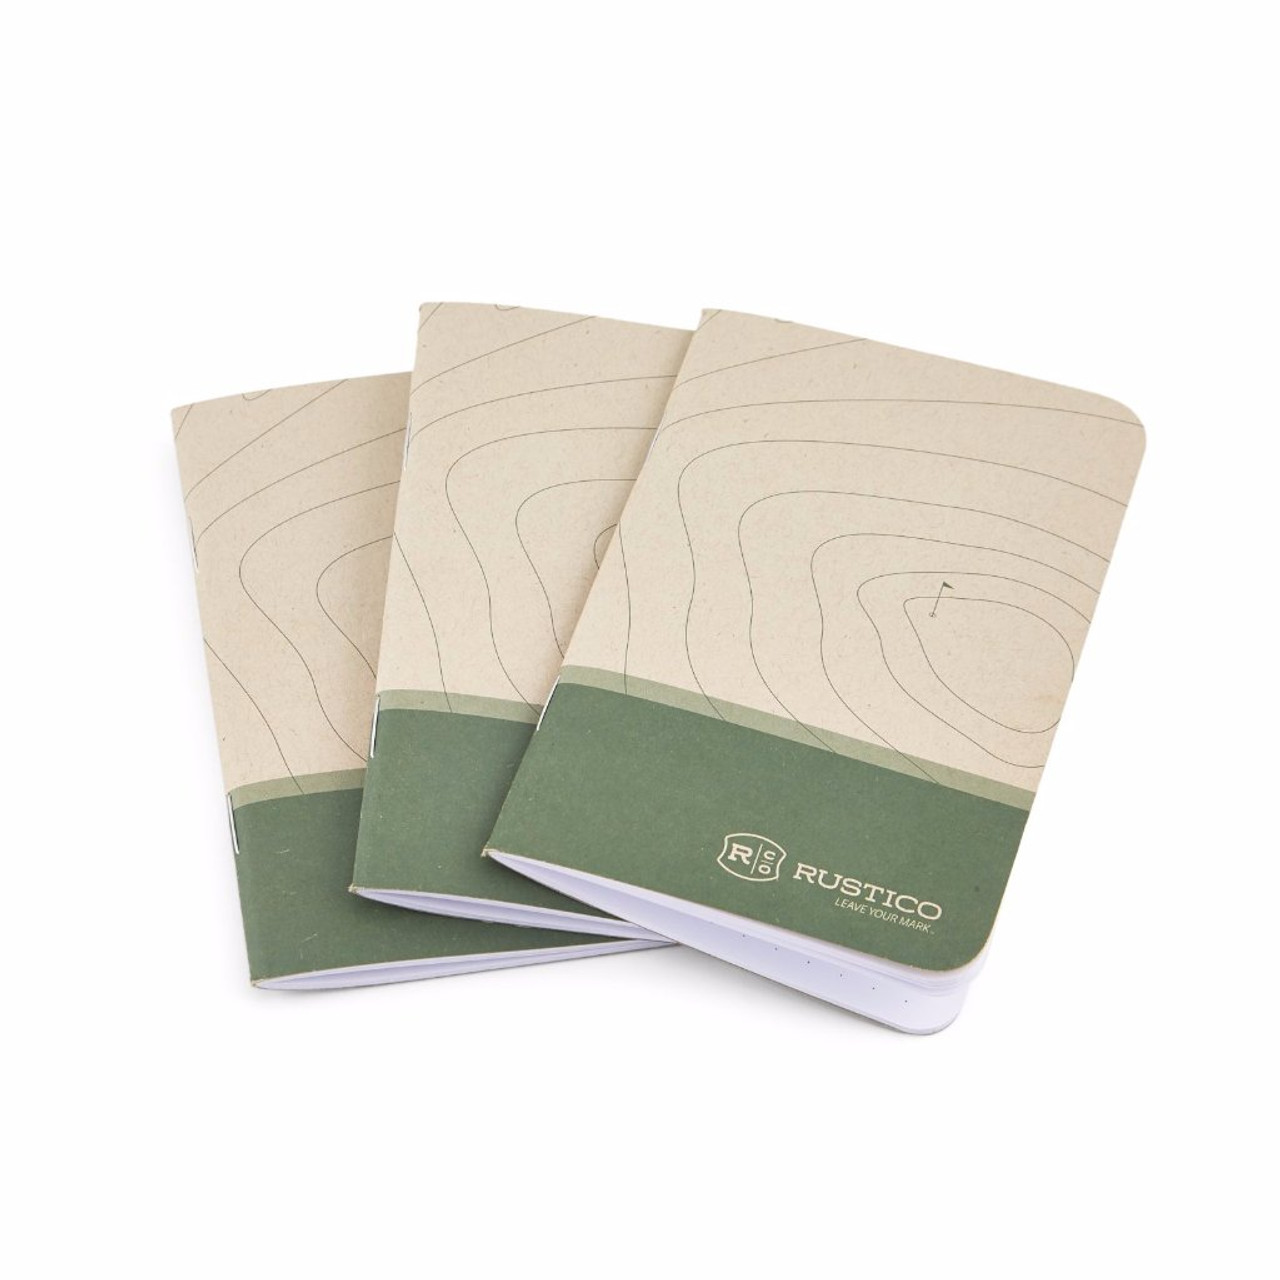 Gold log books